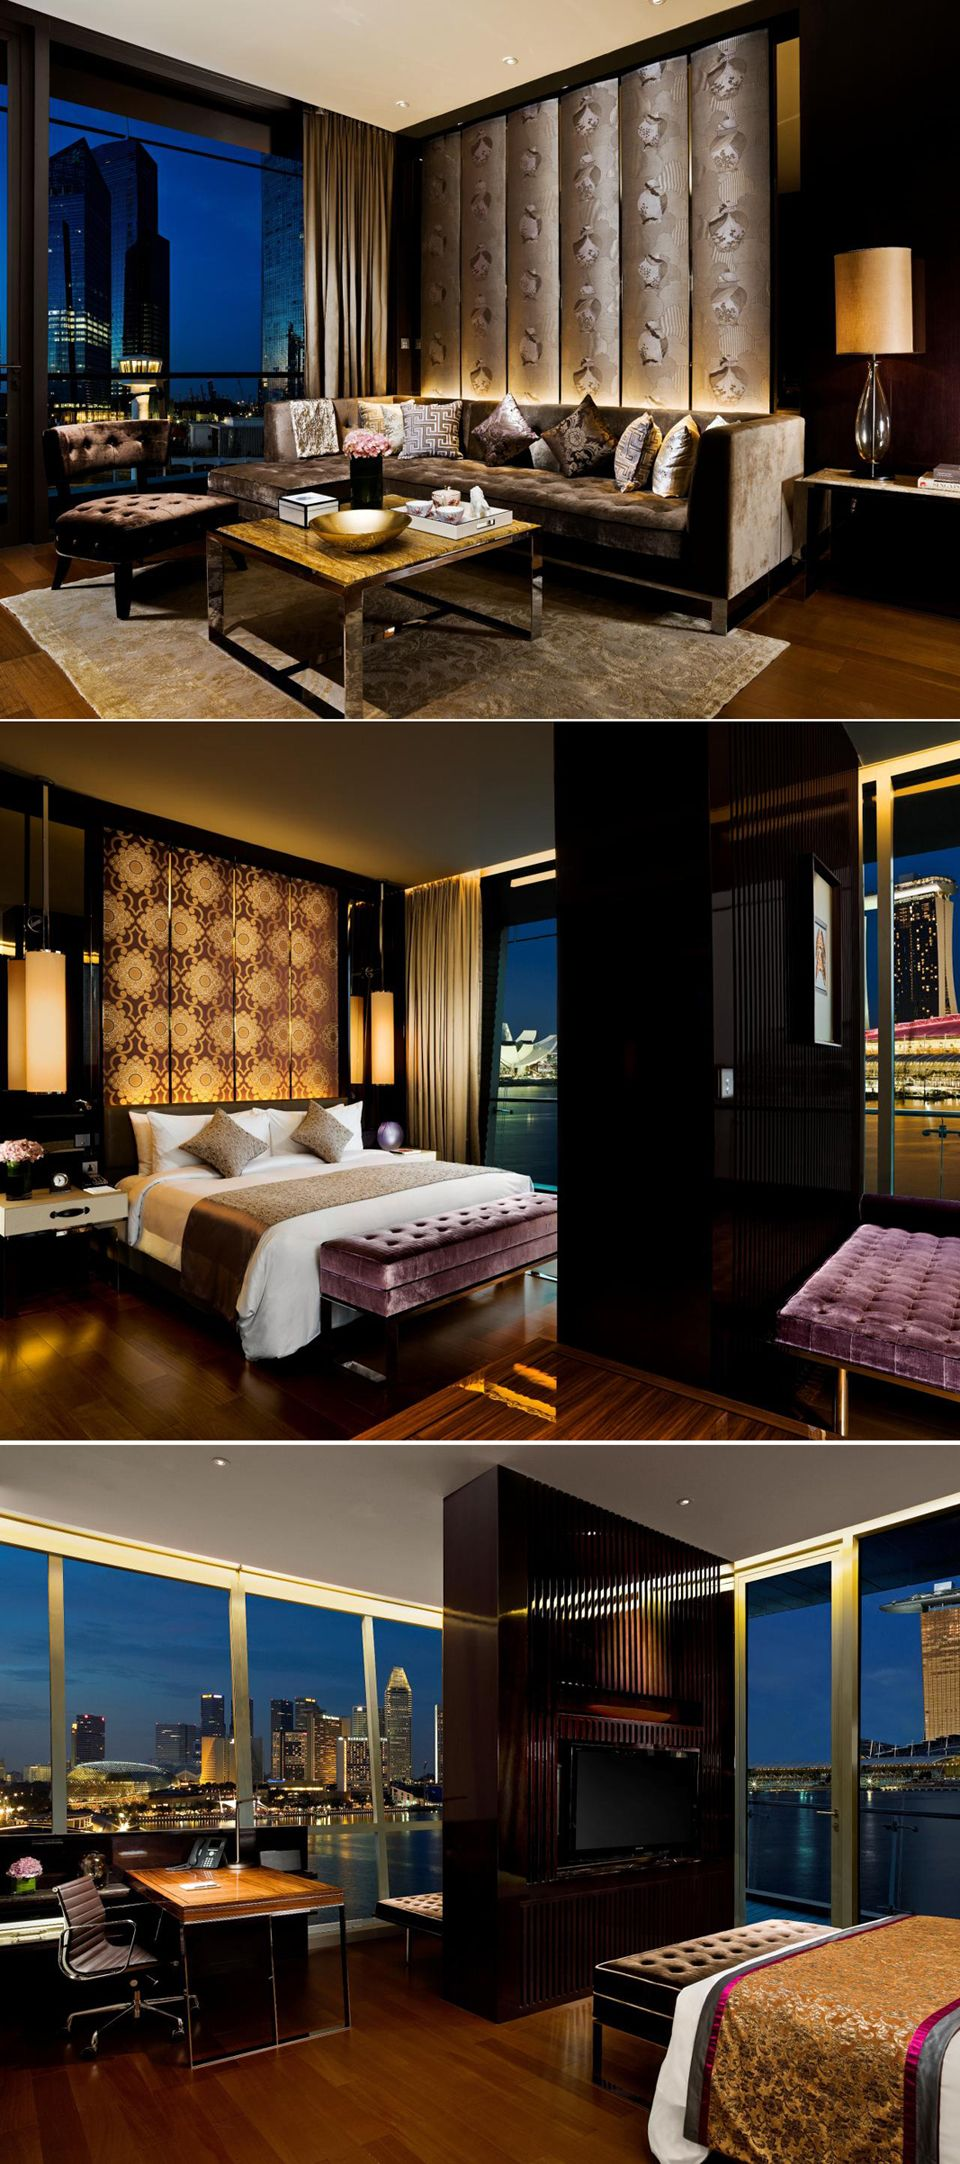 Luxury Interior Design: Luxury Suite Bedroom_The Fullerton Bay Hotel, Singapore By